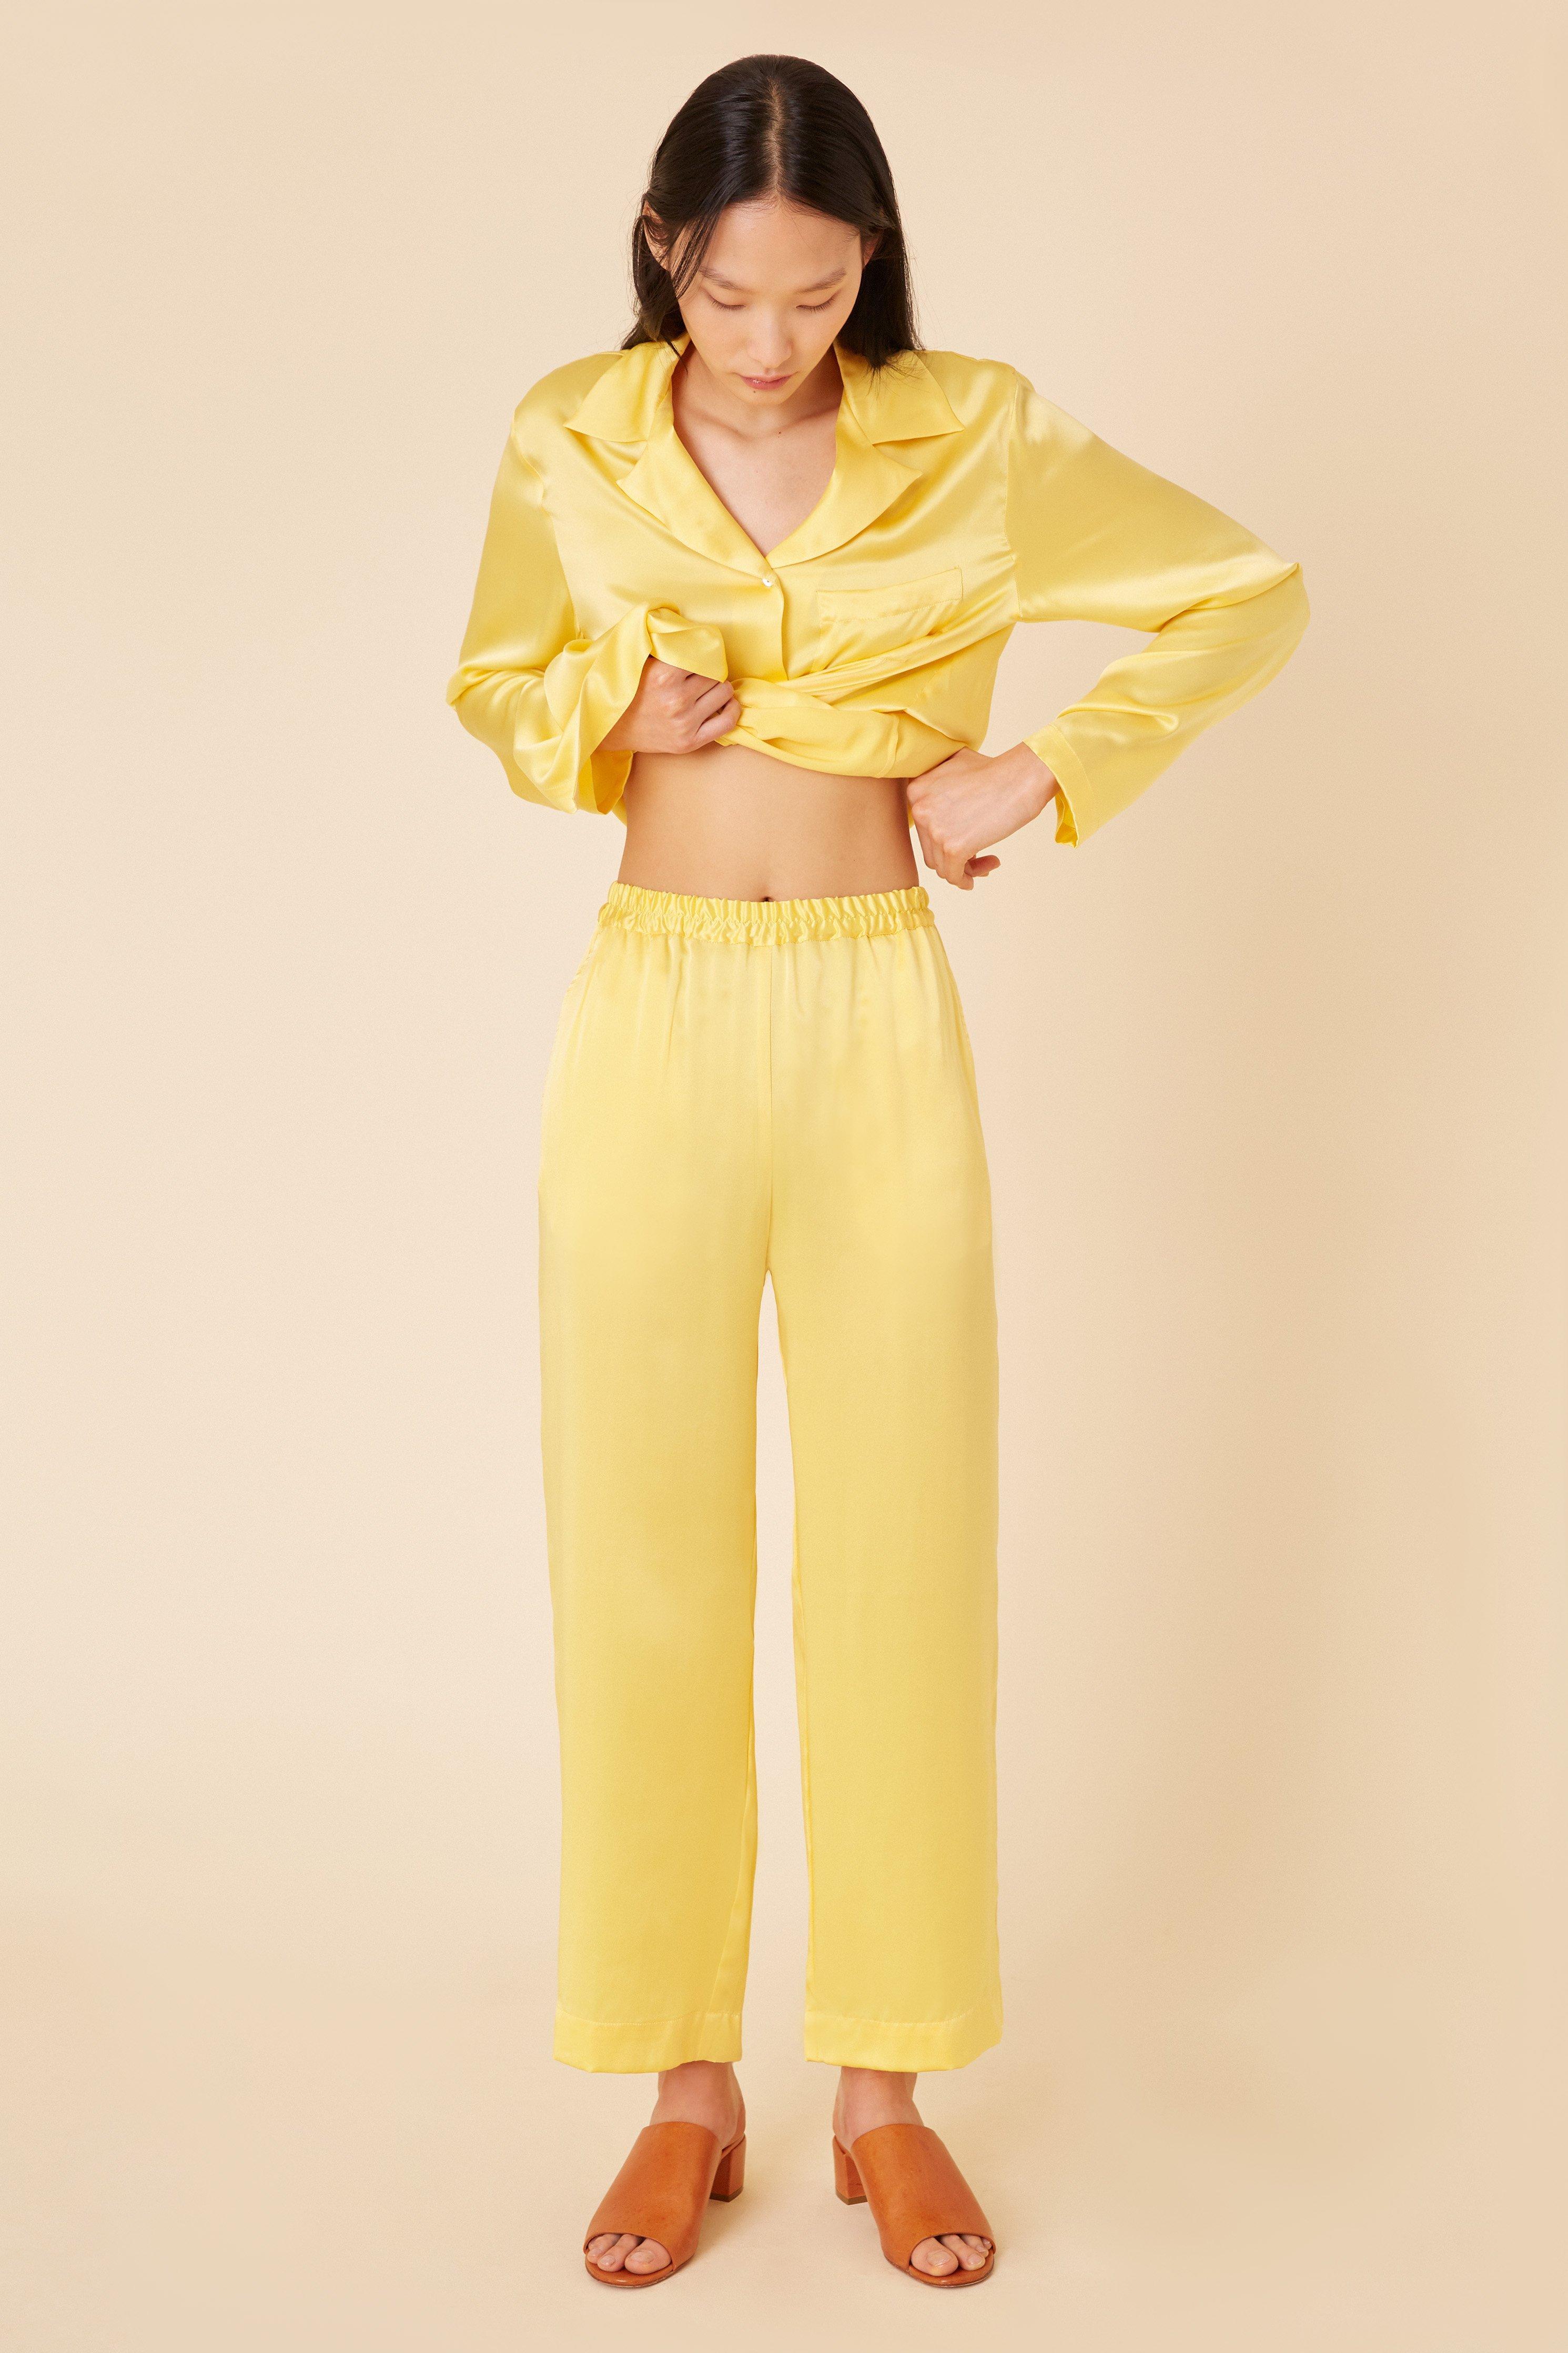 04e8c37e10bcc Lyst - Mansur Gavriel Silk Charmeuse Pajama Pant - Sun in Yellow